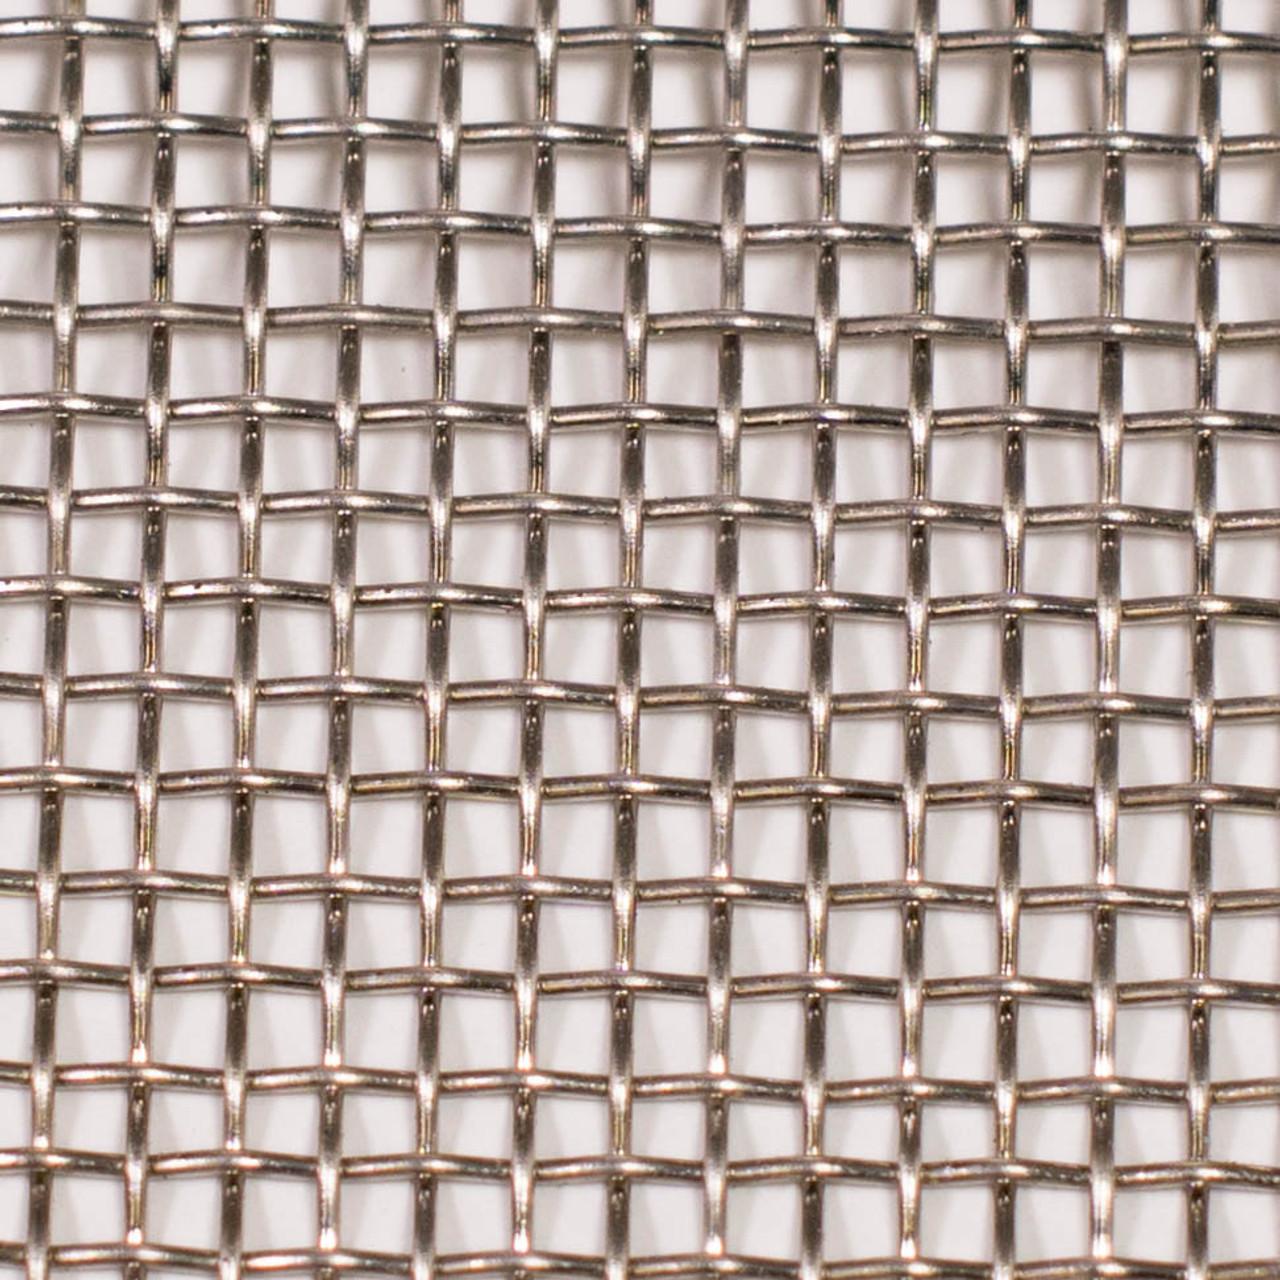 48 Inch x 25 Ft Stainless Steel 023 diameter